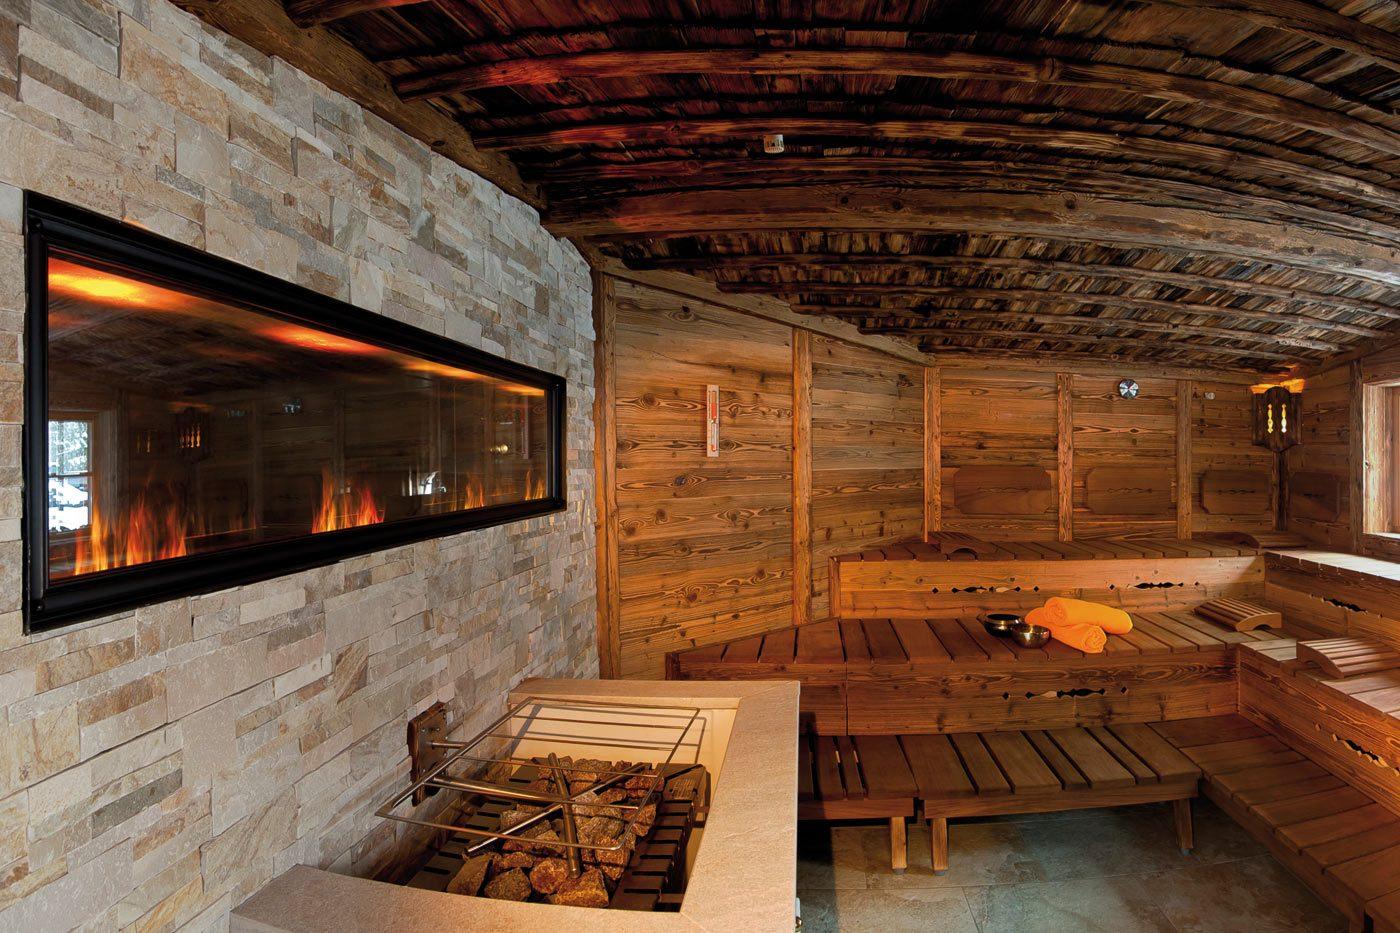 sauna mit fenster av73 hitoiro. Black Bedroom Furniture Sets. Home Design Ideas